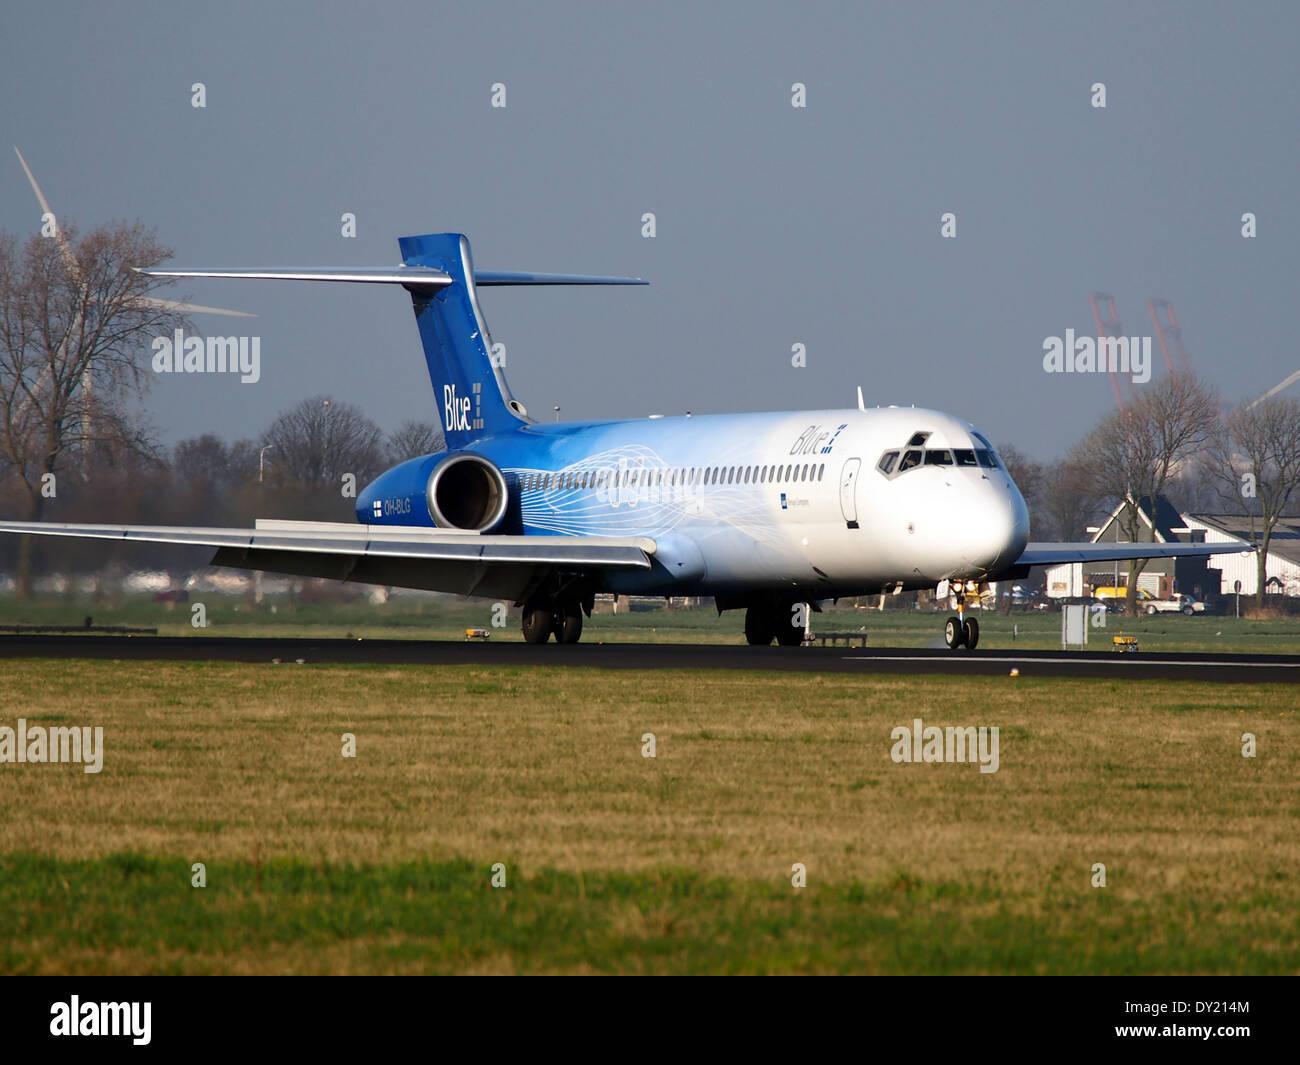 OH-BLG Blue1 Boeing 717-2CM - cn 55059 landing on Schiphol, pic-1 Stock Photo